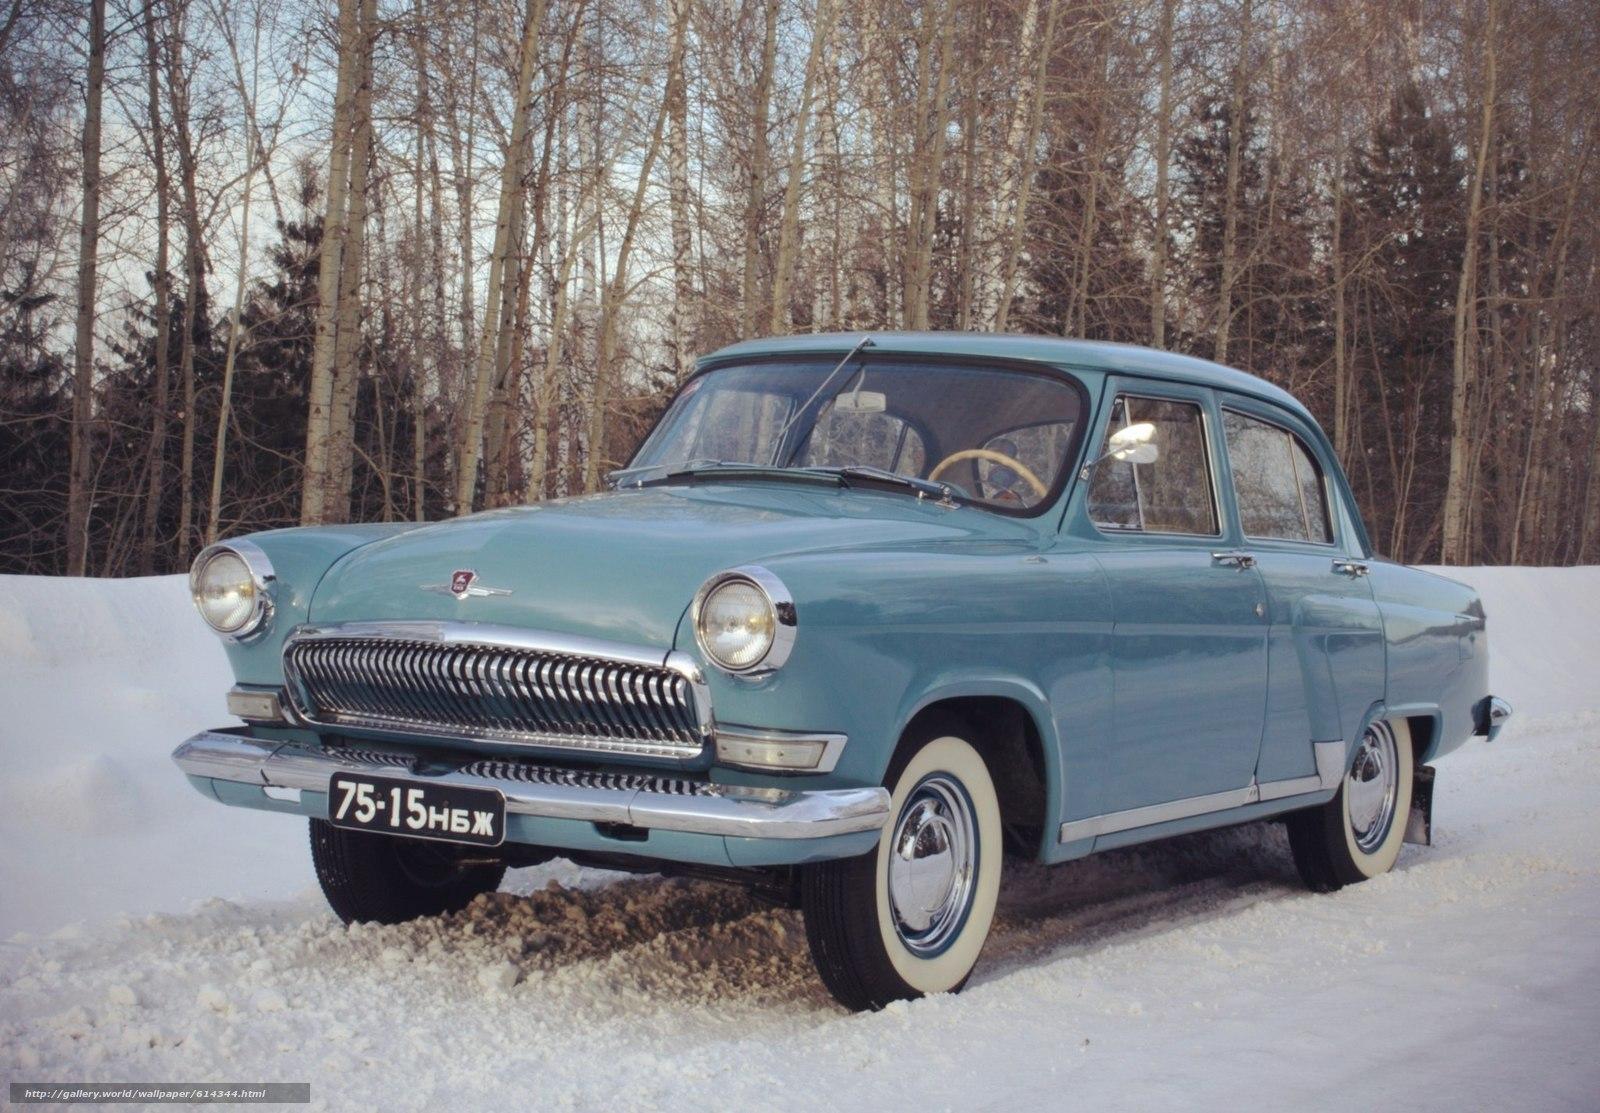 Download wallpaper car,  Car,  machine,  ussr free desktop wallpaper in the resolution 2048x1424 — picture №614344